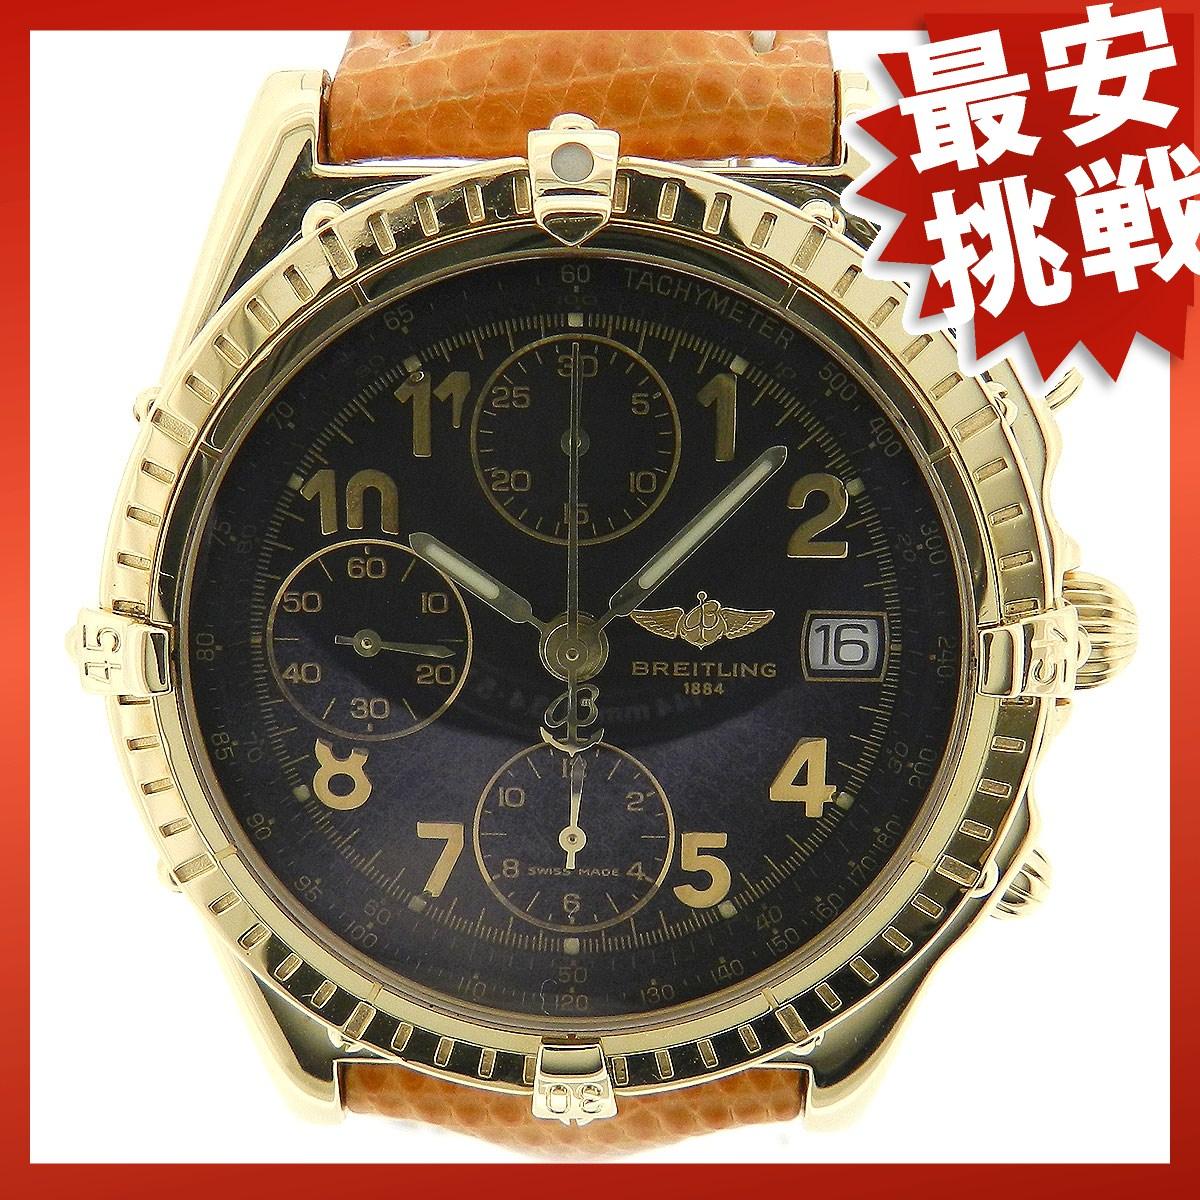 BREITLING chronomat K13050.1 watch K18YG / leather men's